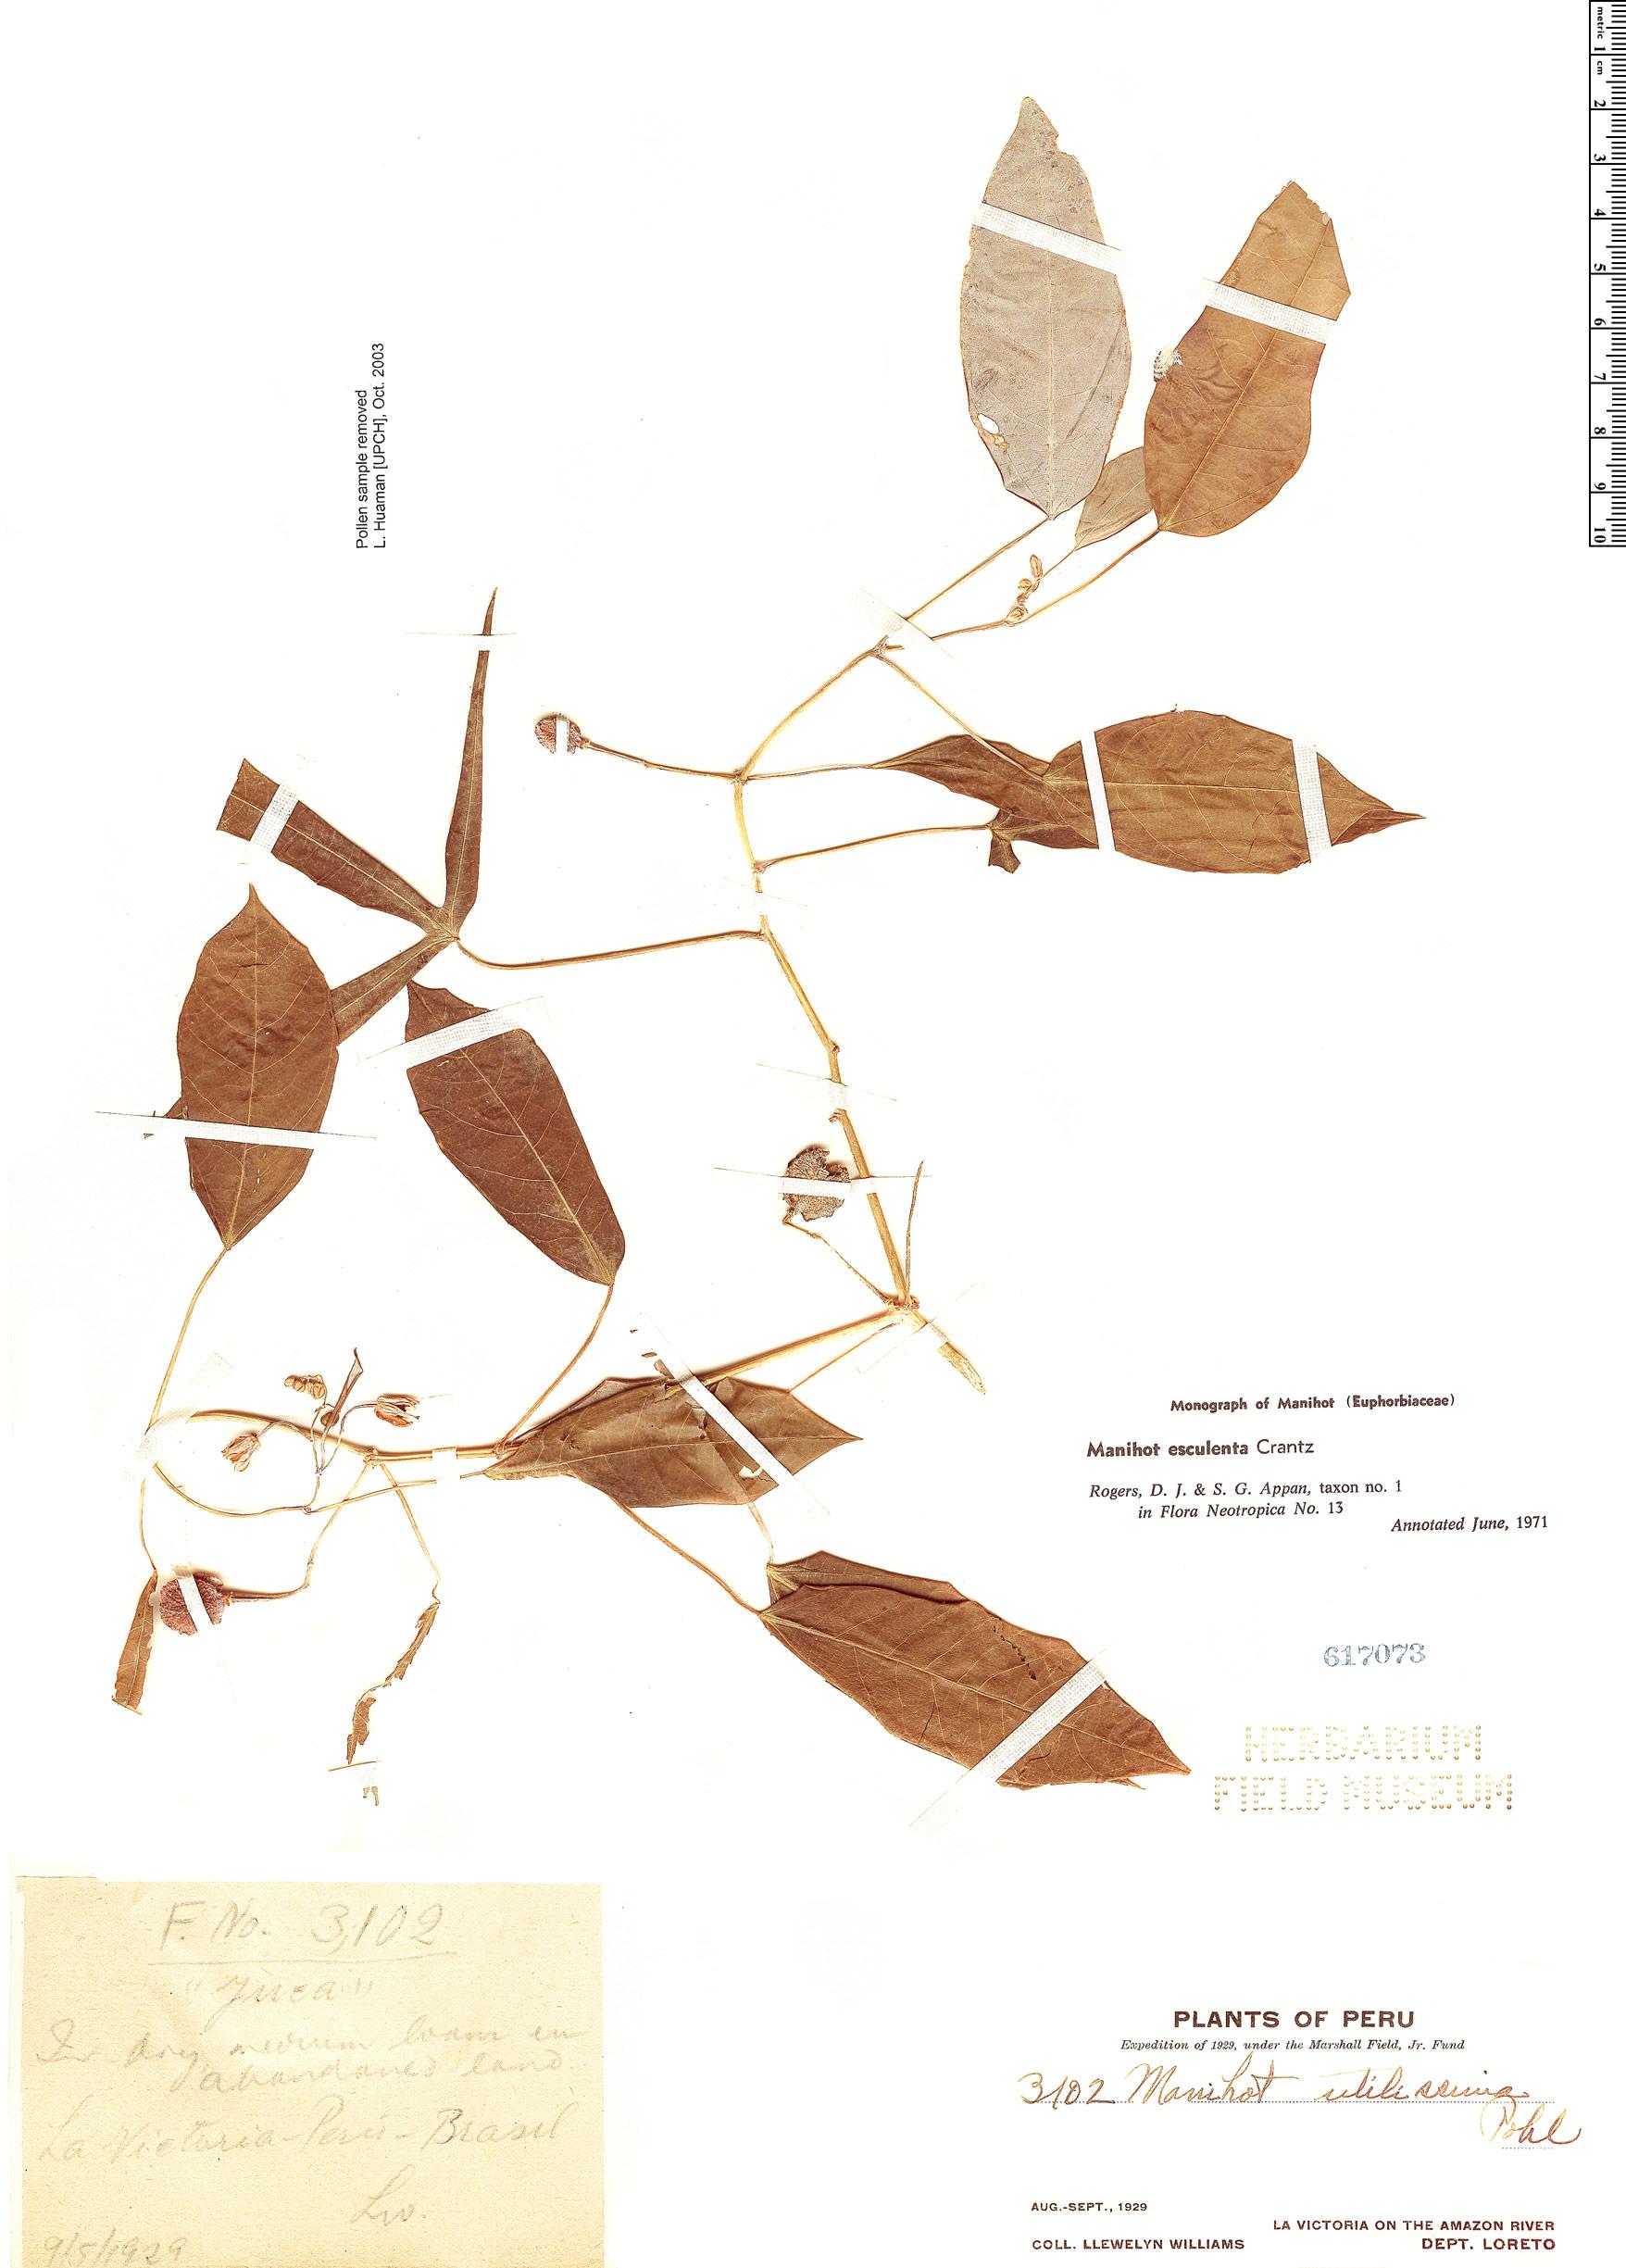 Specimen: Manihot esculenta